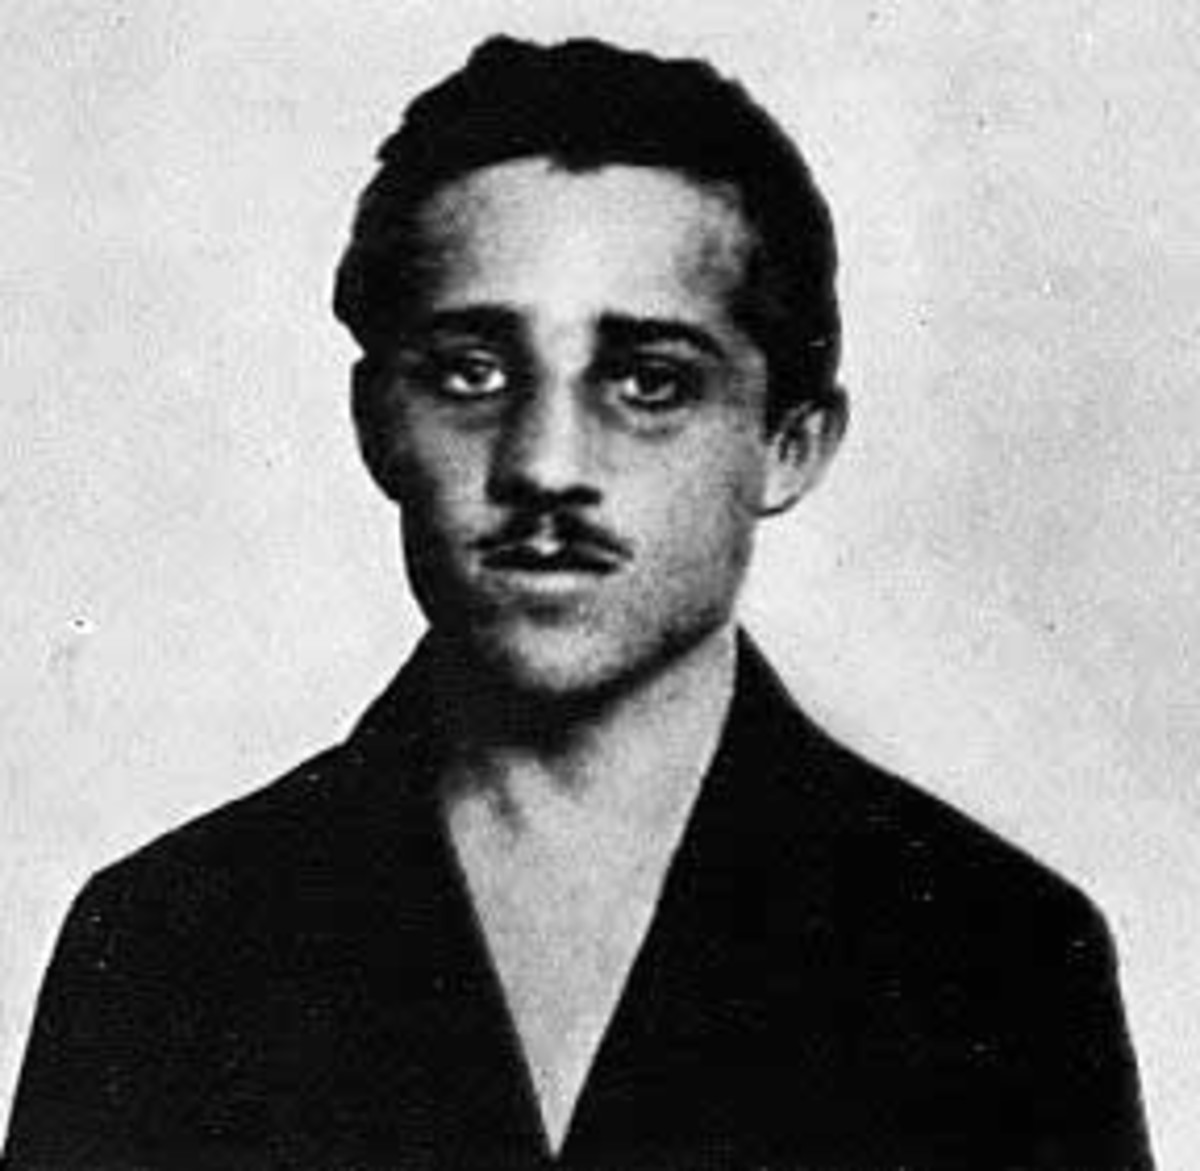 WW1. Gavrilo Princip. Shot the Archduke and his wife.